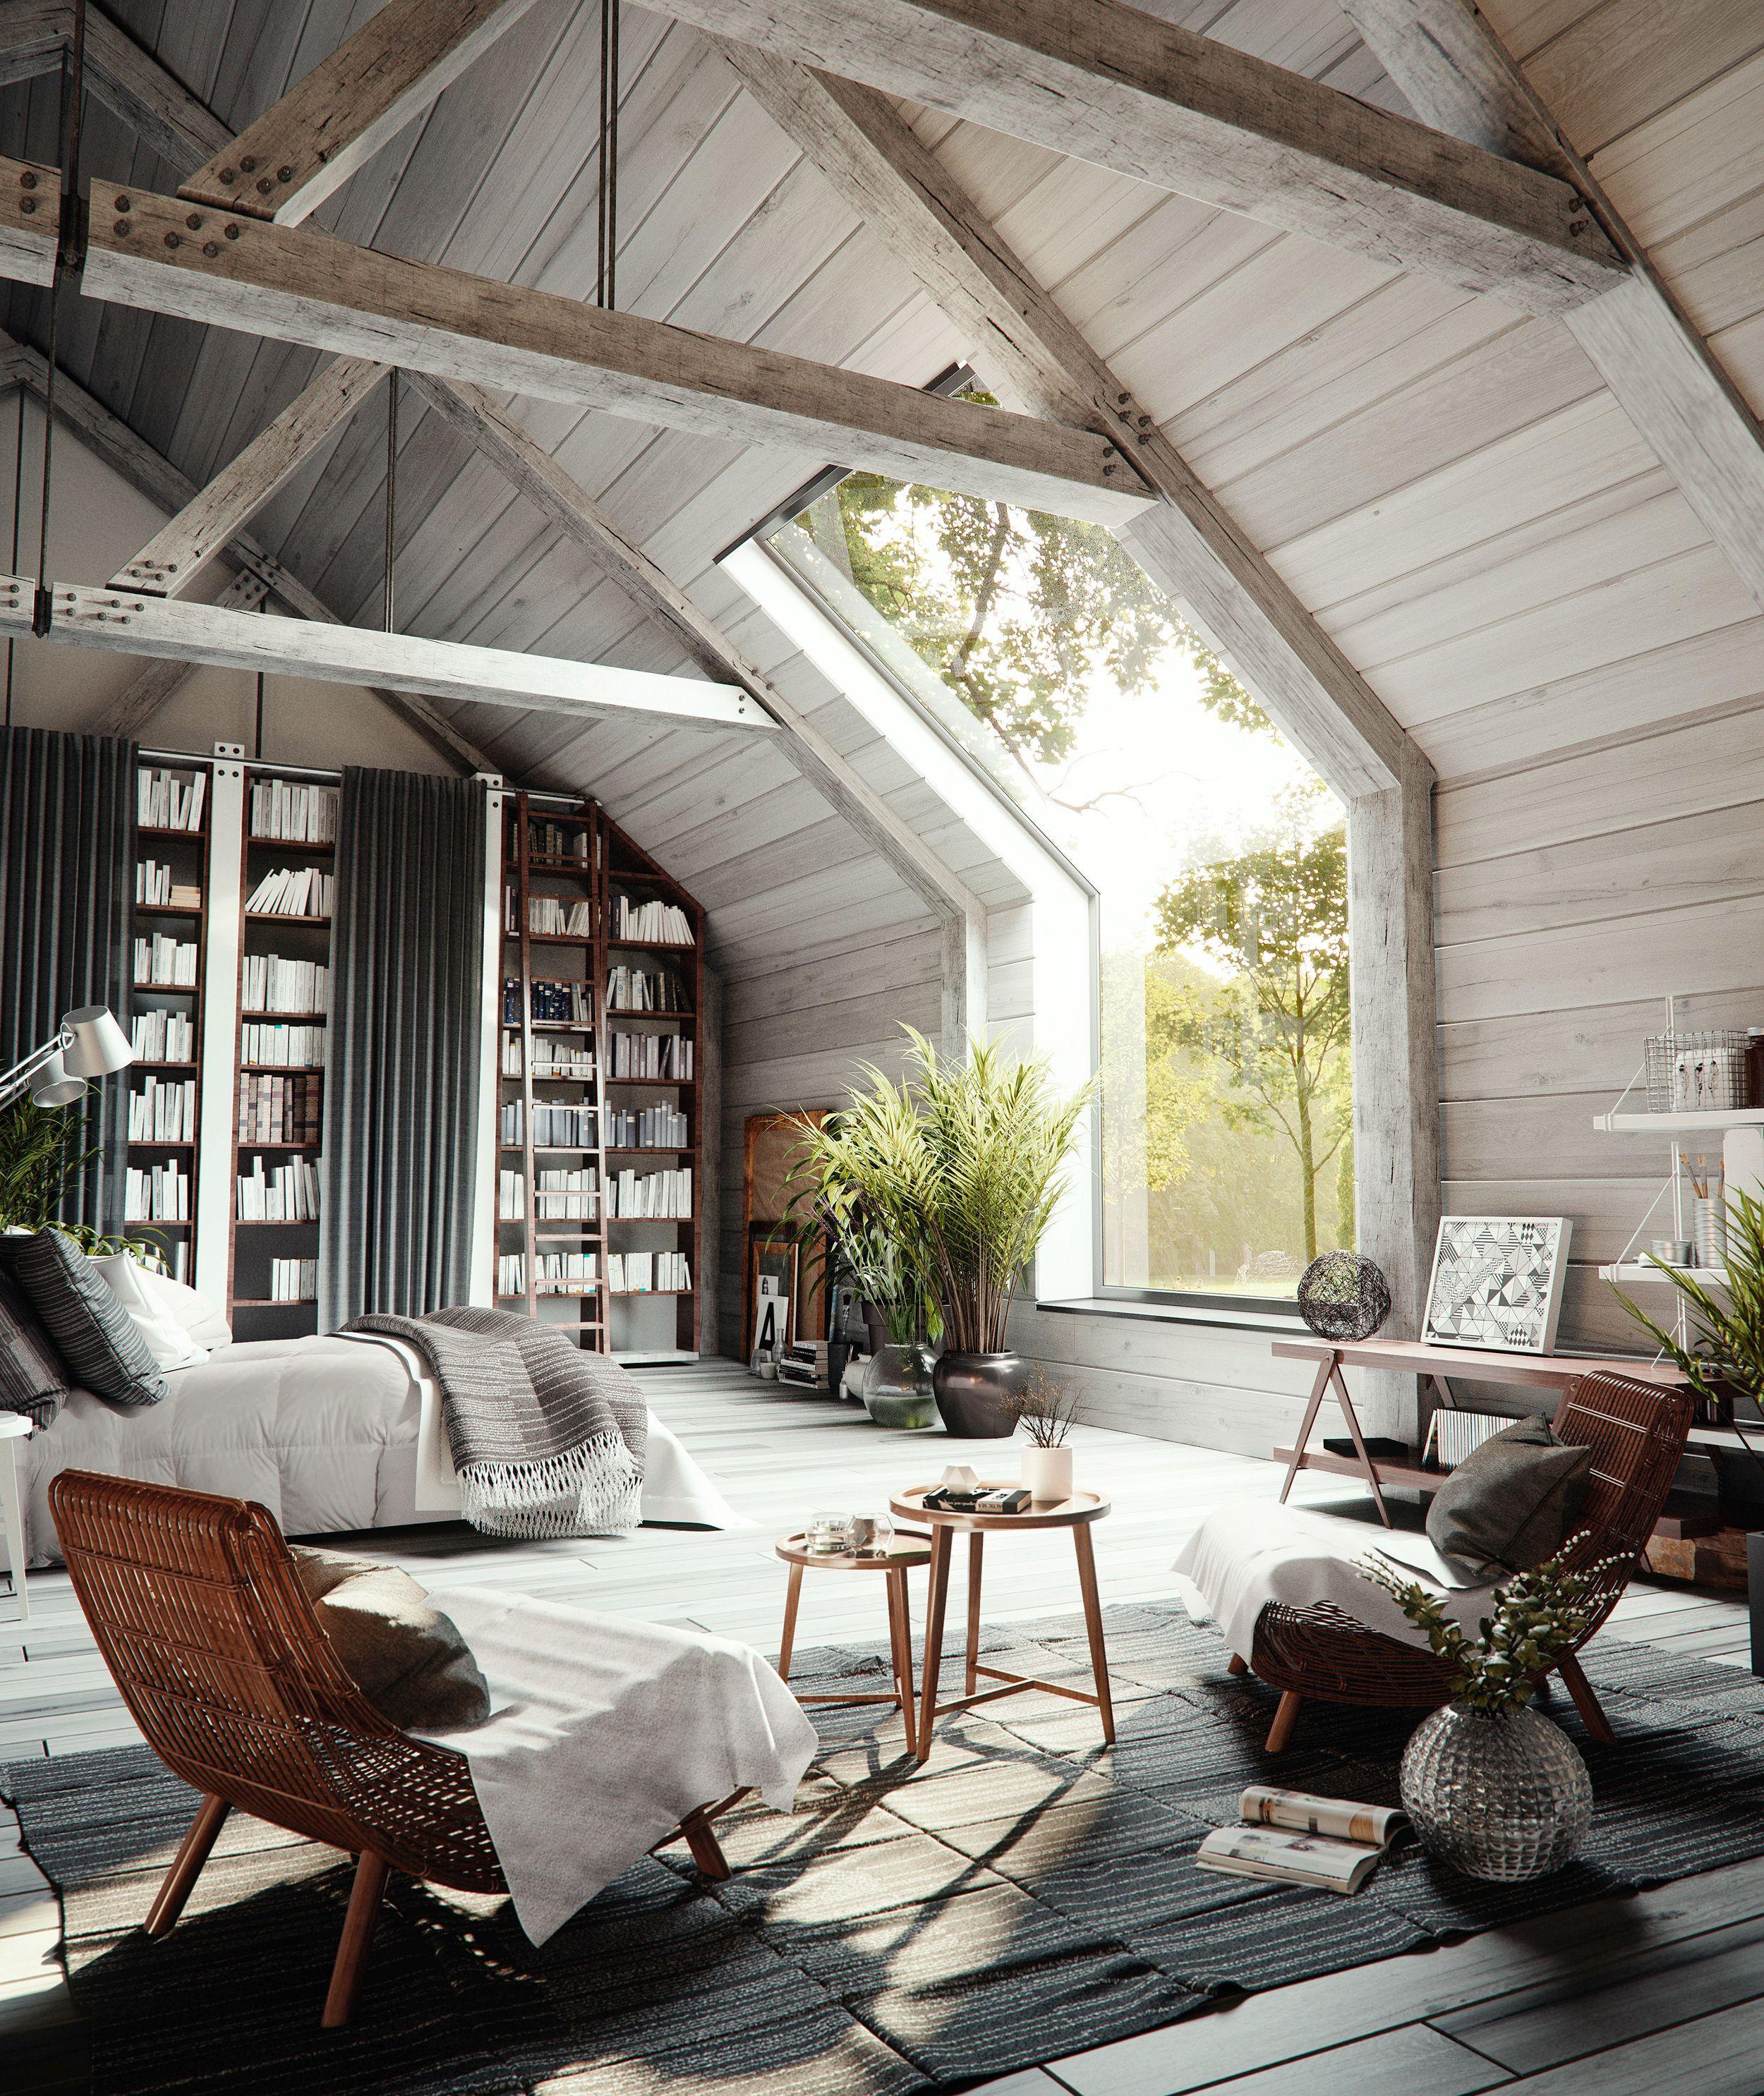 Mountain Fixer Upper The 5 Styles We Didn T Choose Rustic Bedroom Design Rustic Master Bedroom Rustic Interiors